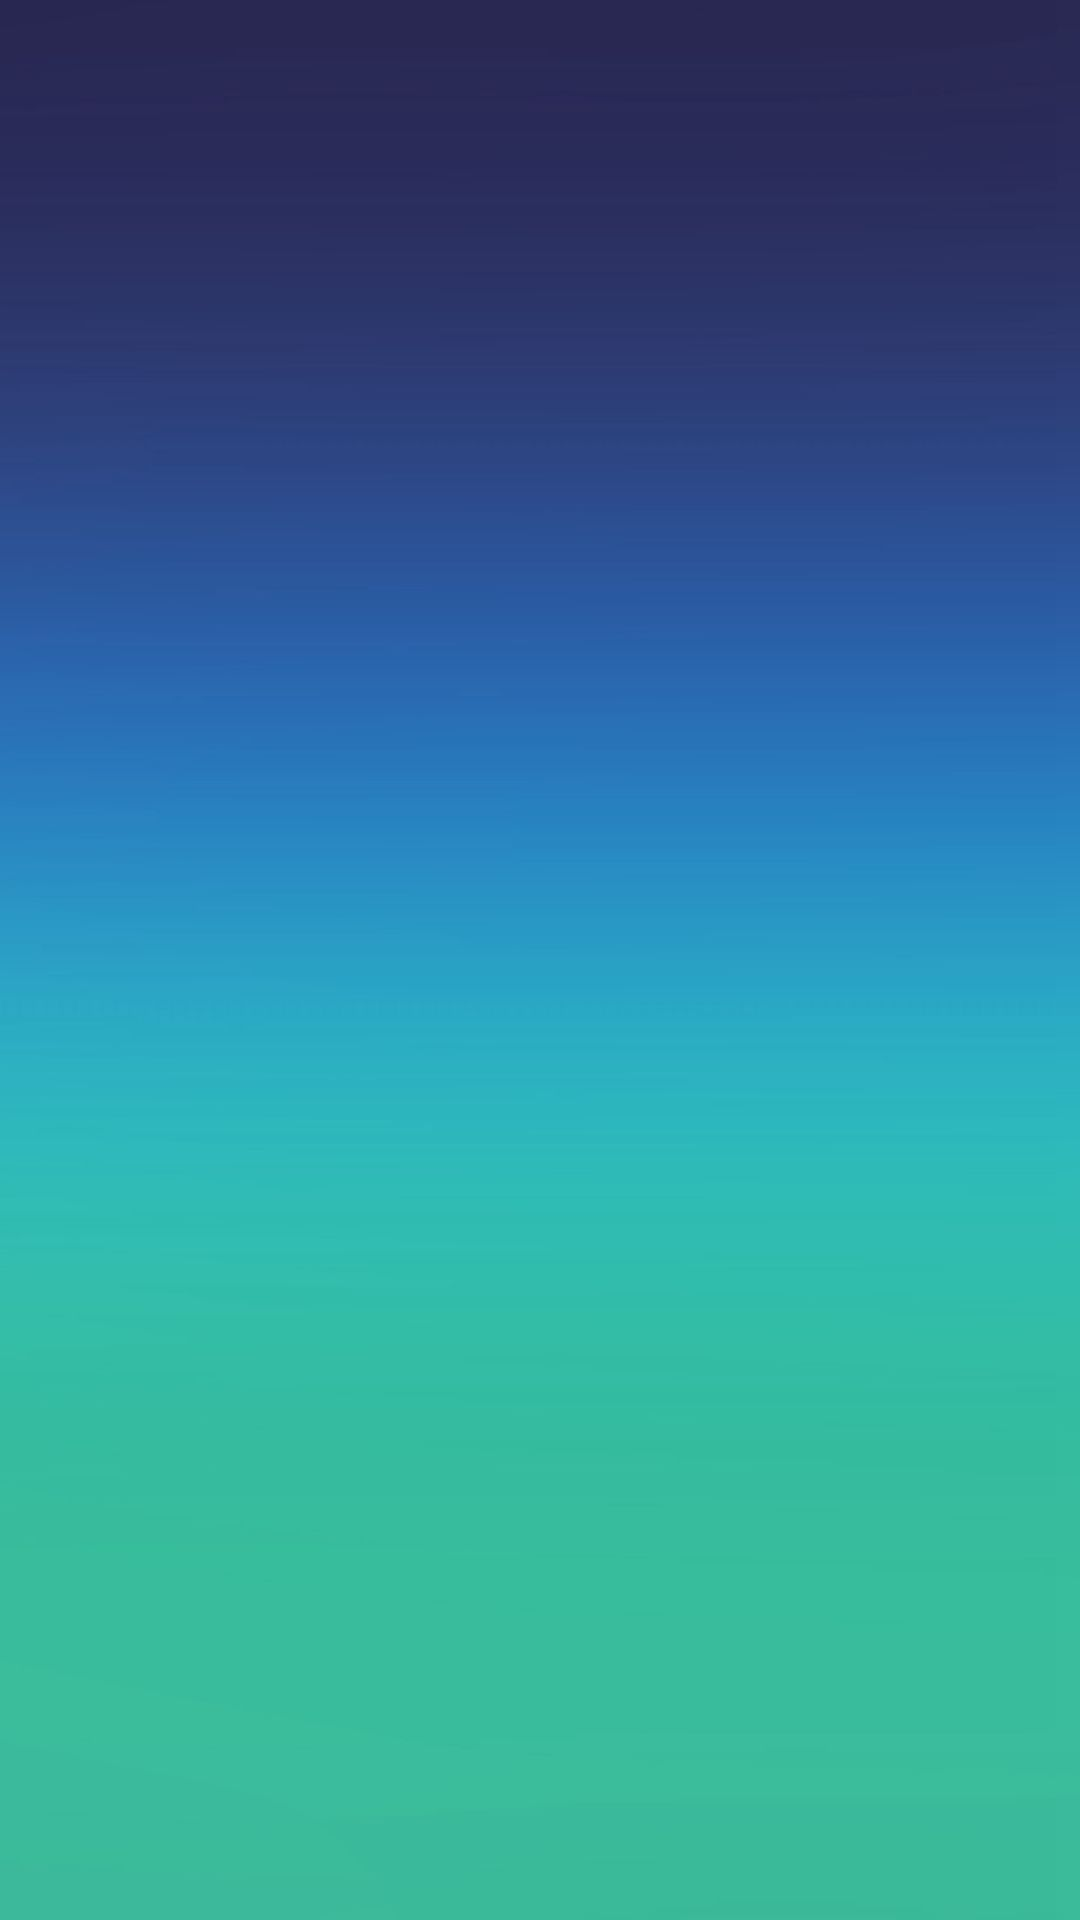 Nintendo Green Blue Gradation Blur #iPhone #6 #plus